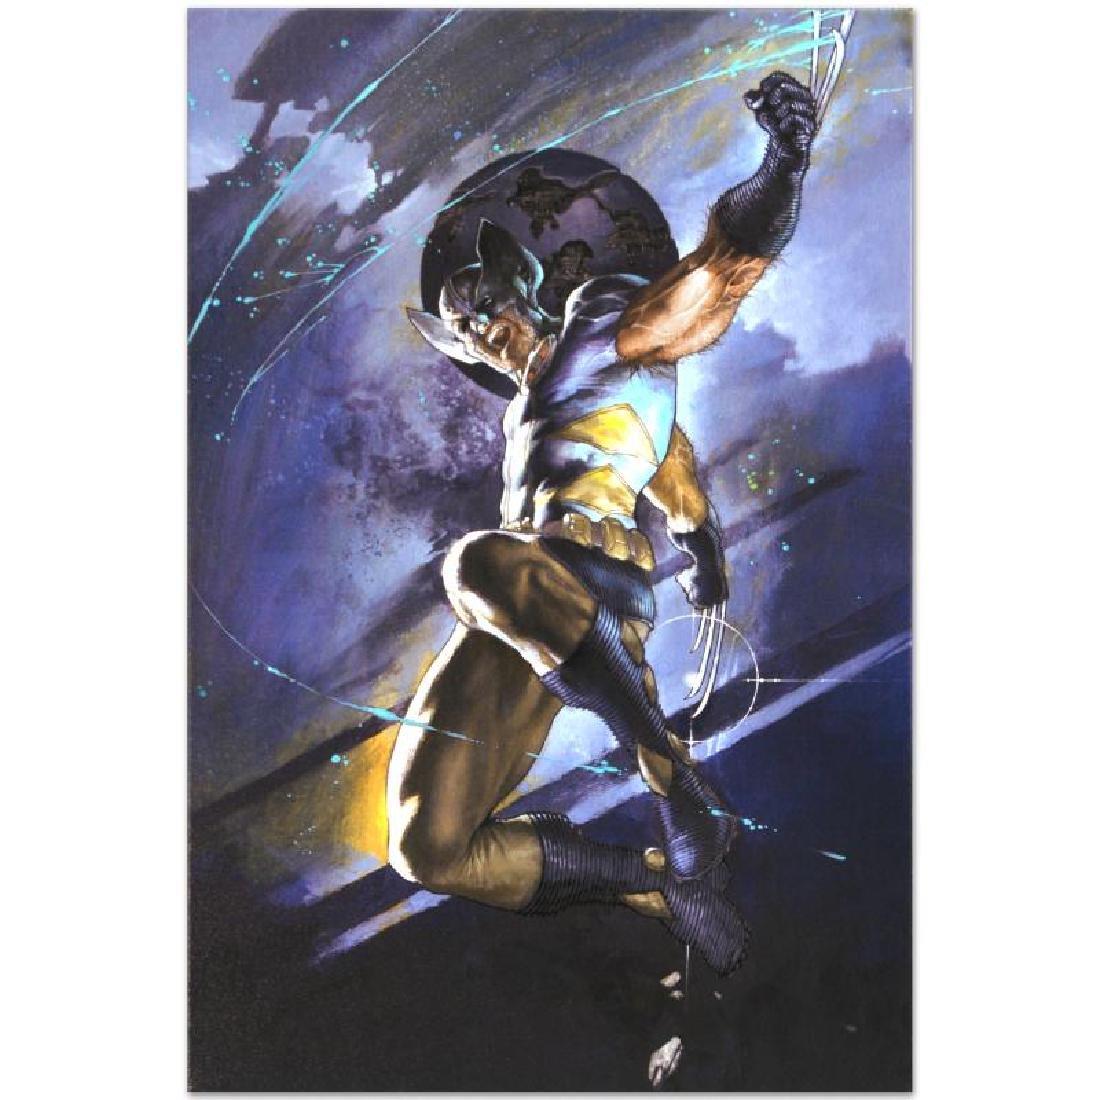 Uncanny X-Men #539 by Marvel Comics - 3